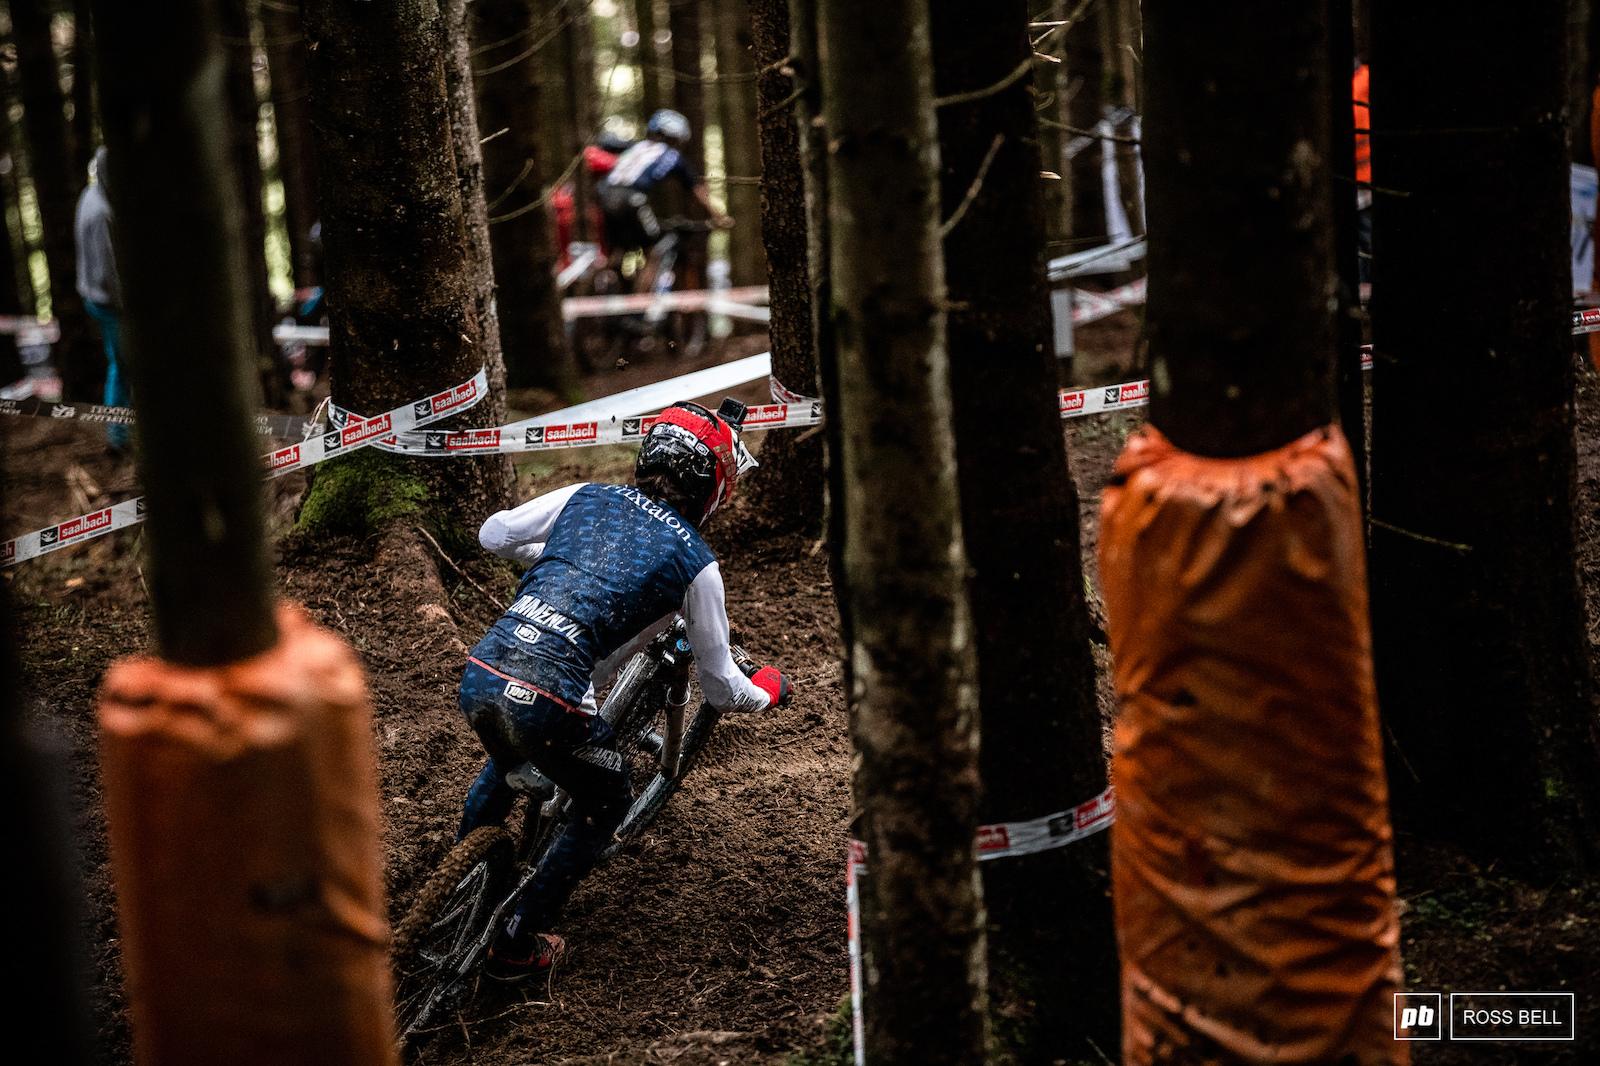 Hugo Frixtalon weaves through the trees in the fresh section.